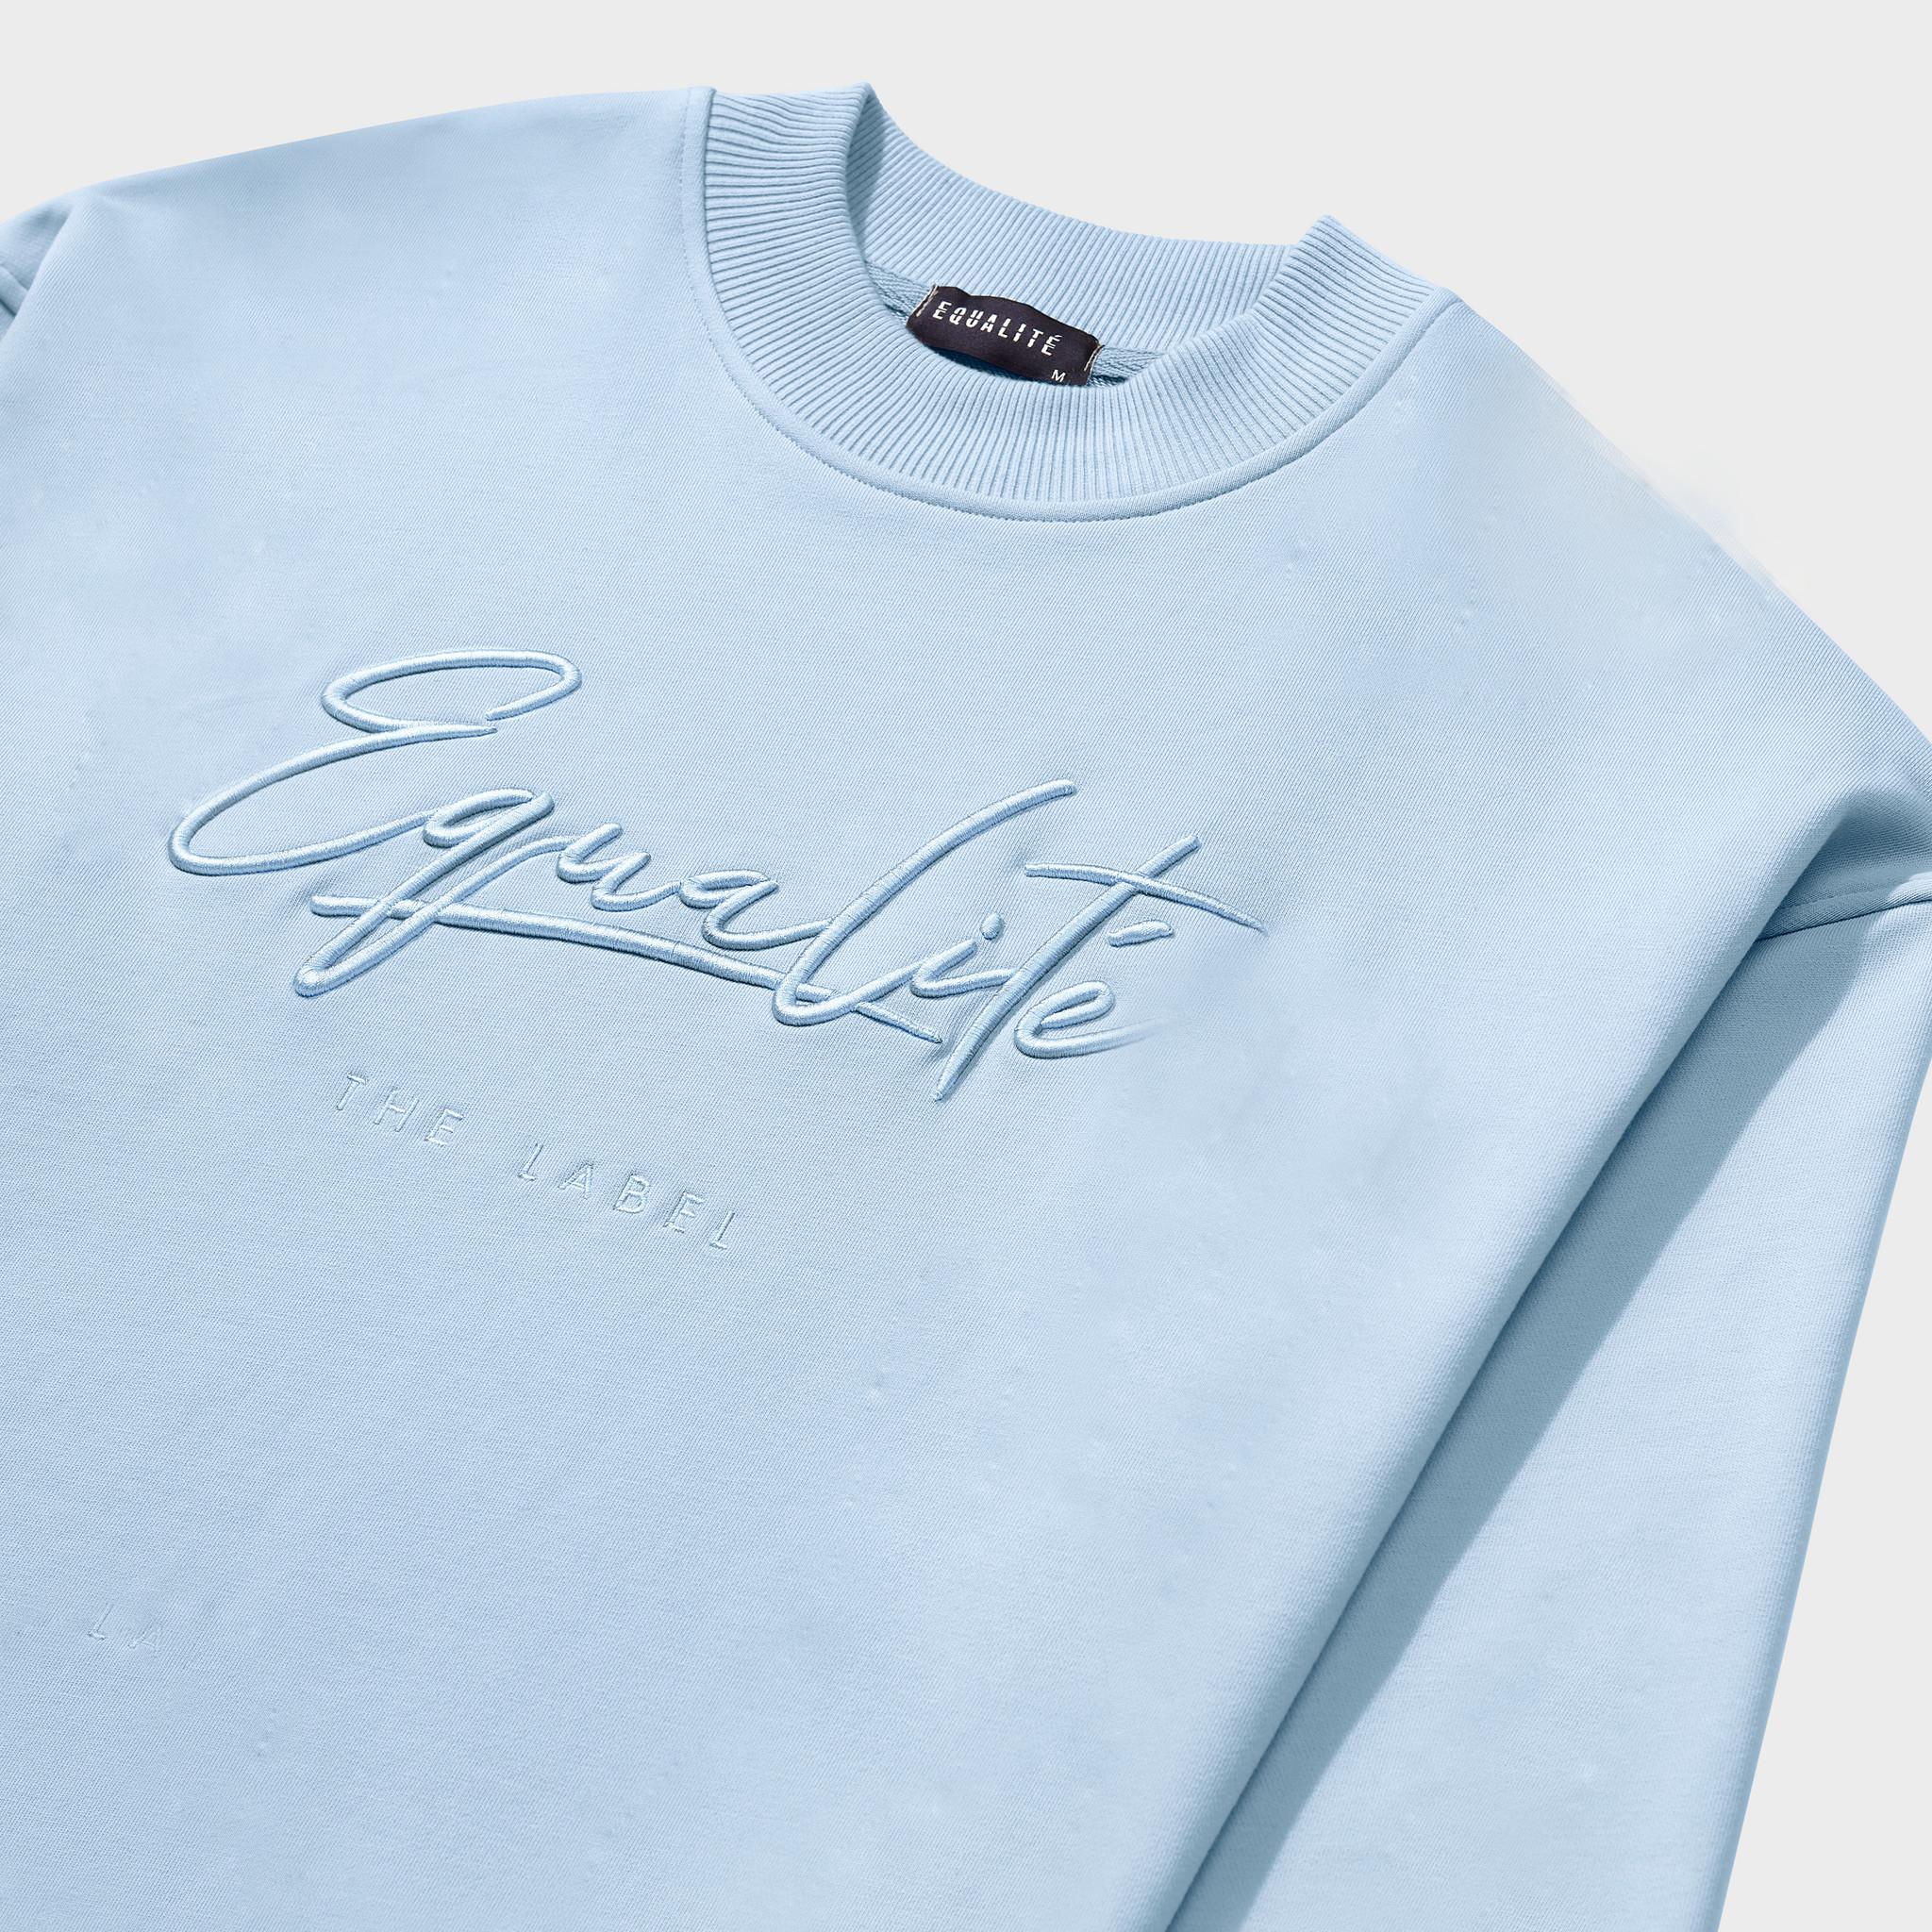 Wafi Signature Sweater Light Blue-3